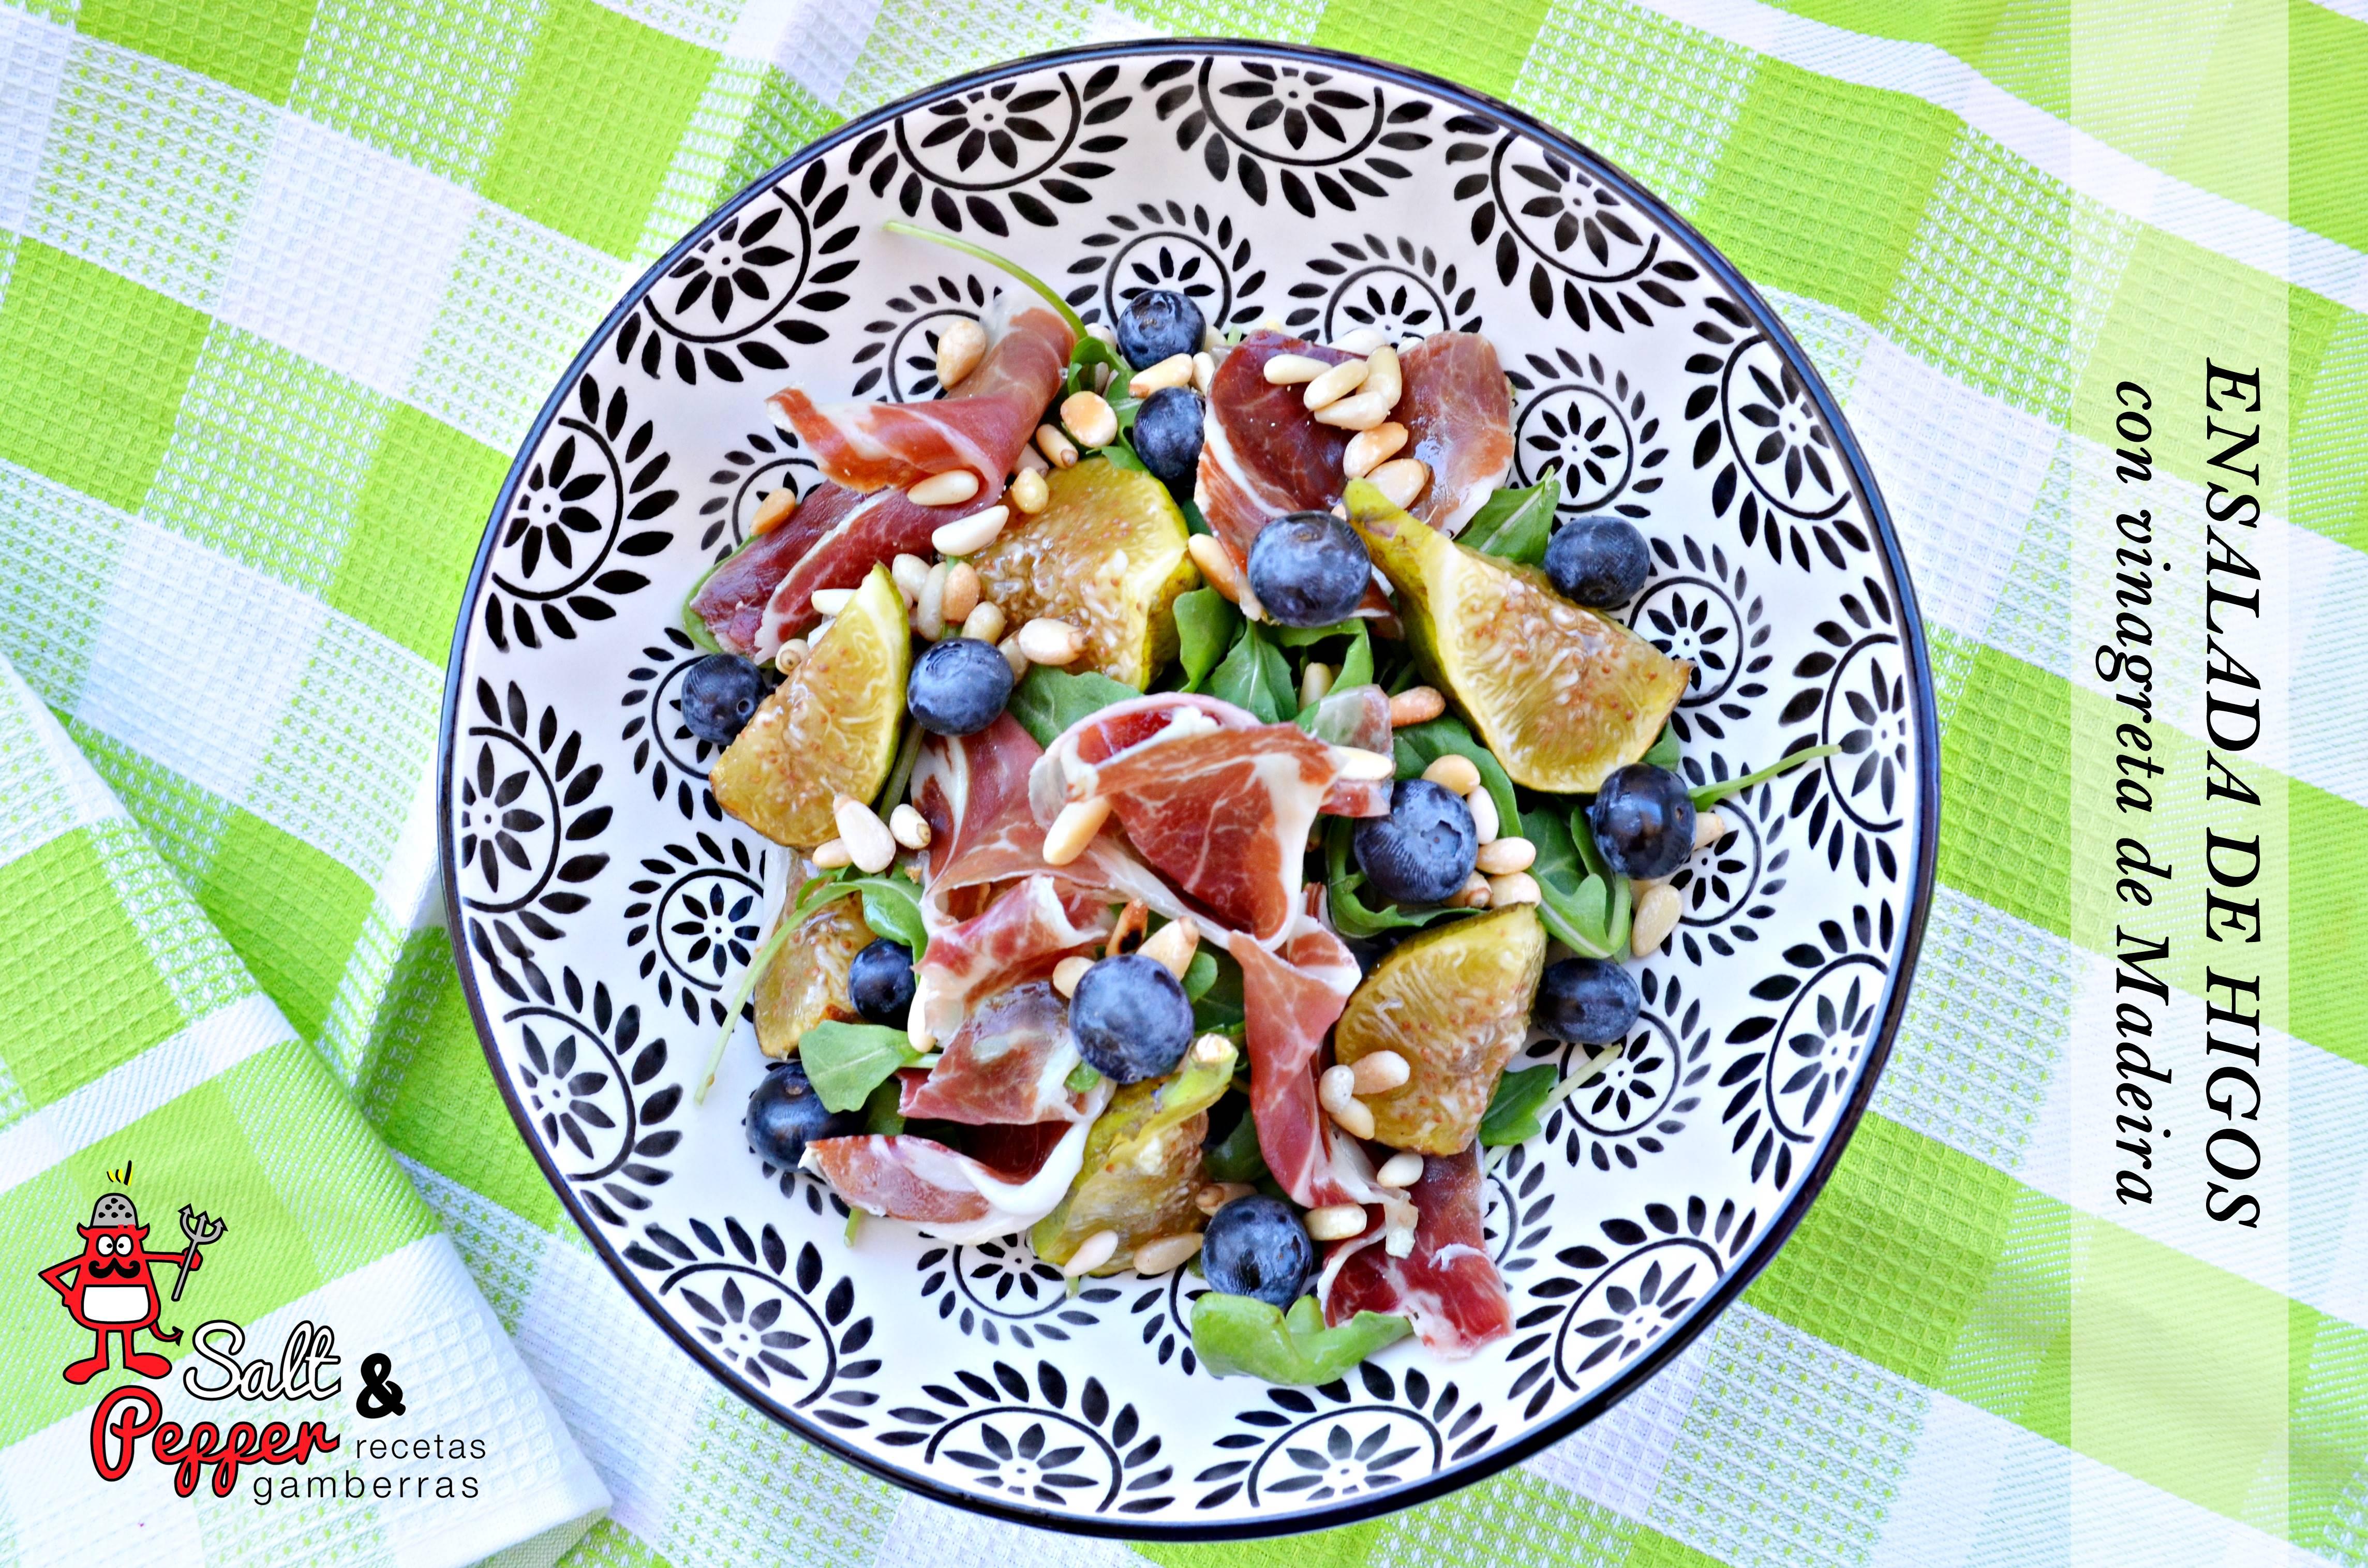 Ensalada de higos, jamón serrano, arándanos y piñones con vinagreta de Madeira.